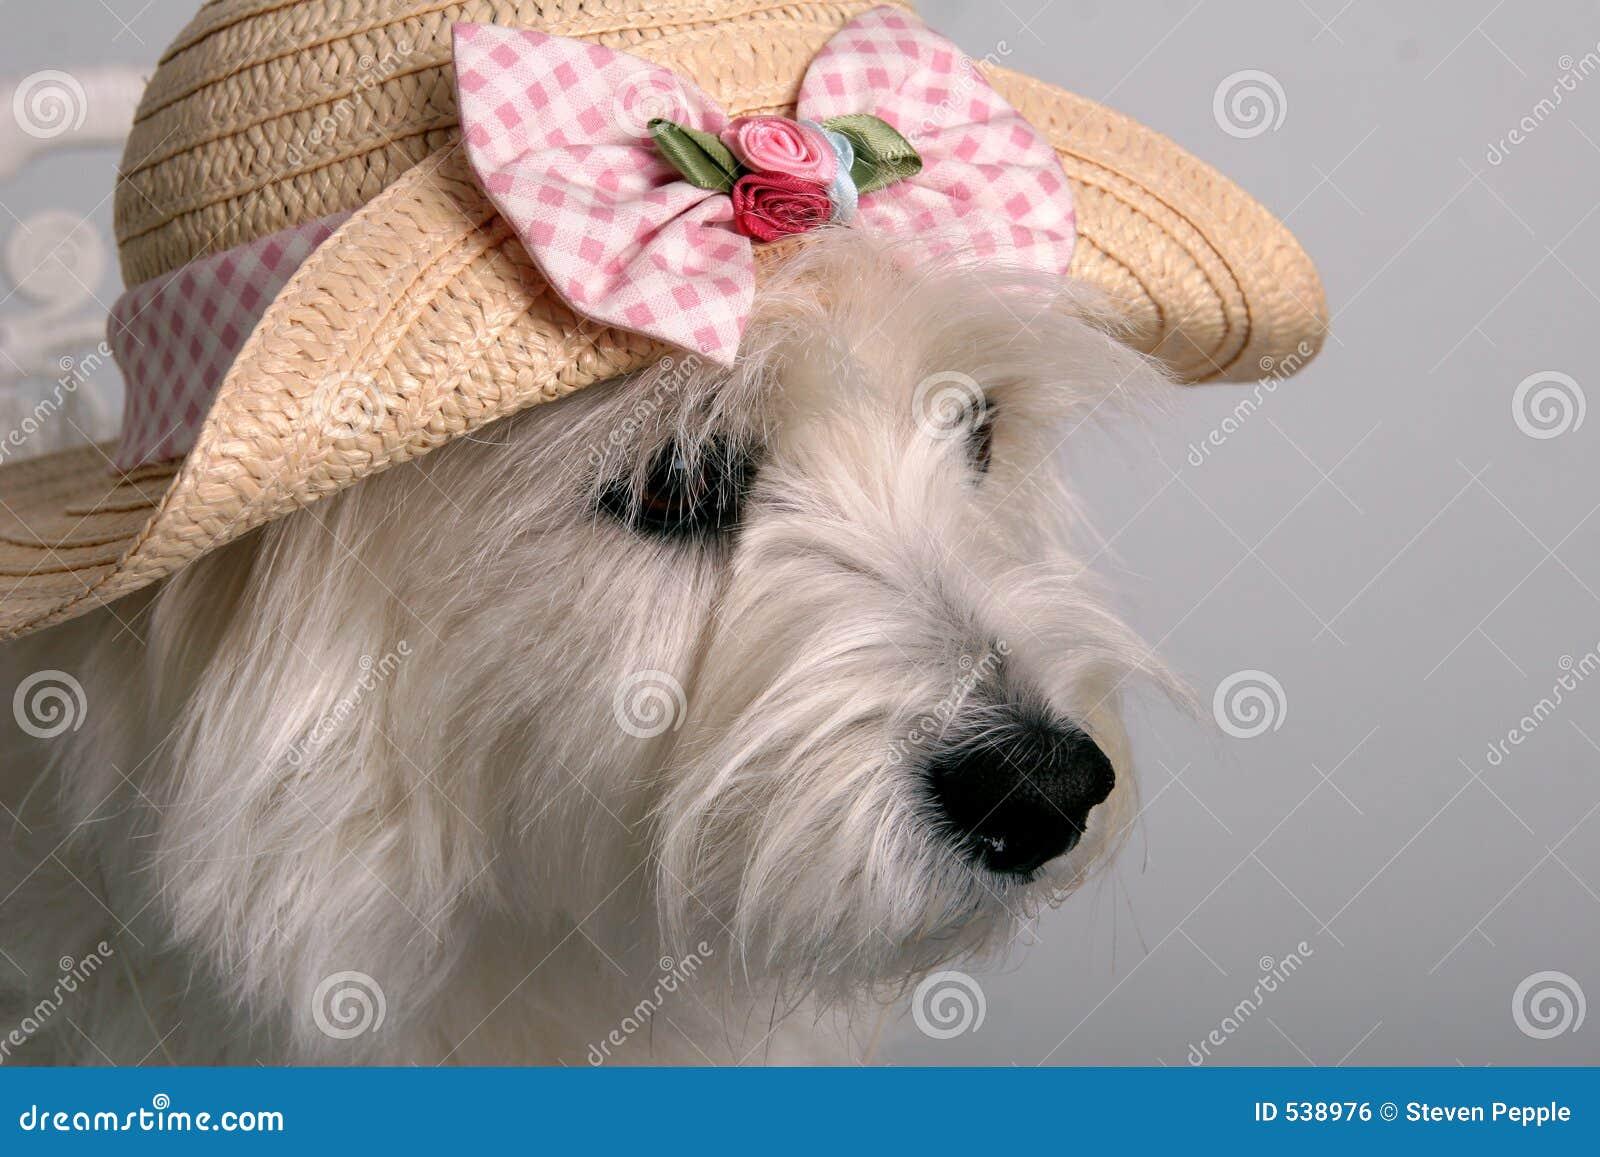 Download 穿戴的弹簧 库存照片. 图片 包括有 bonneville, 宠物, 乐趣, 高地, 帽子, 空白, 春天, 纵向 - 538976